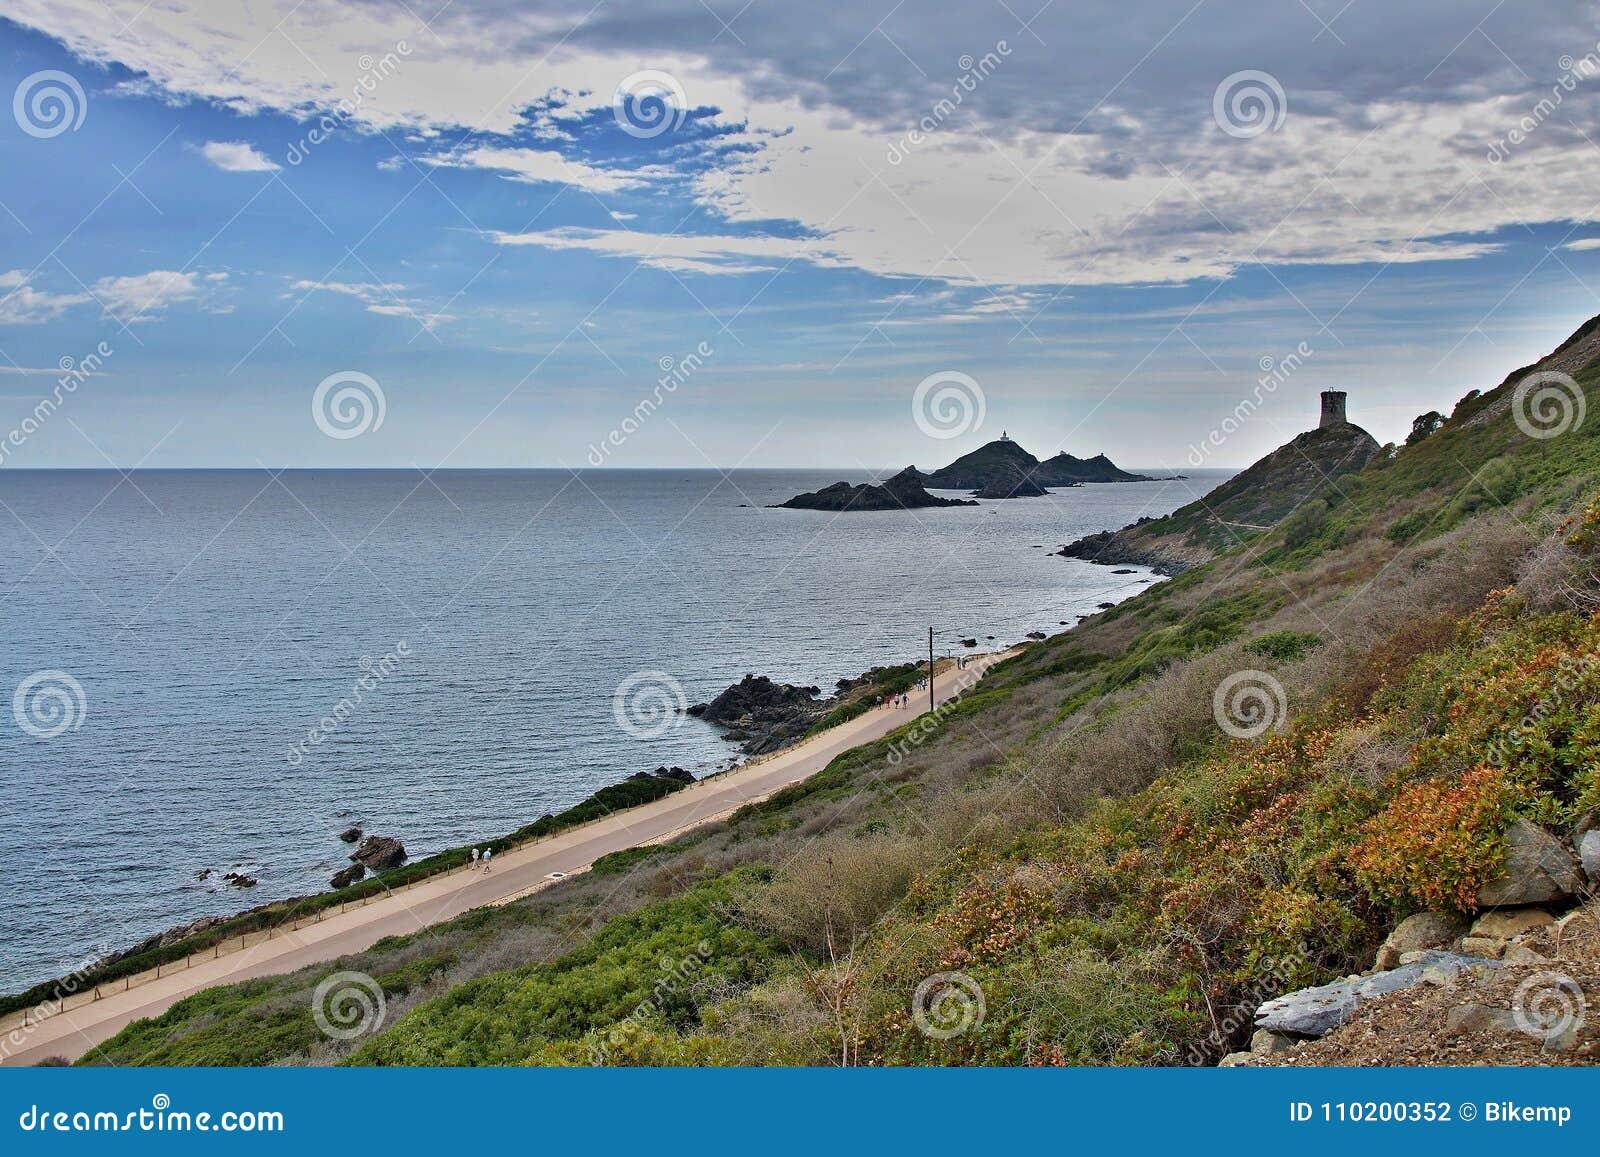 Corsica-Parata cape and islands Iles Sanguinaires